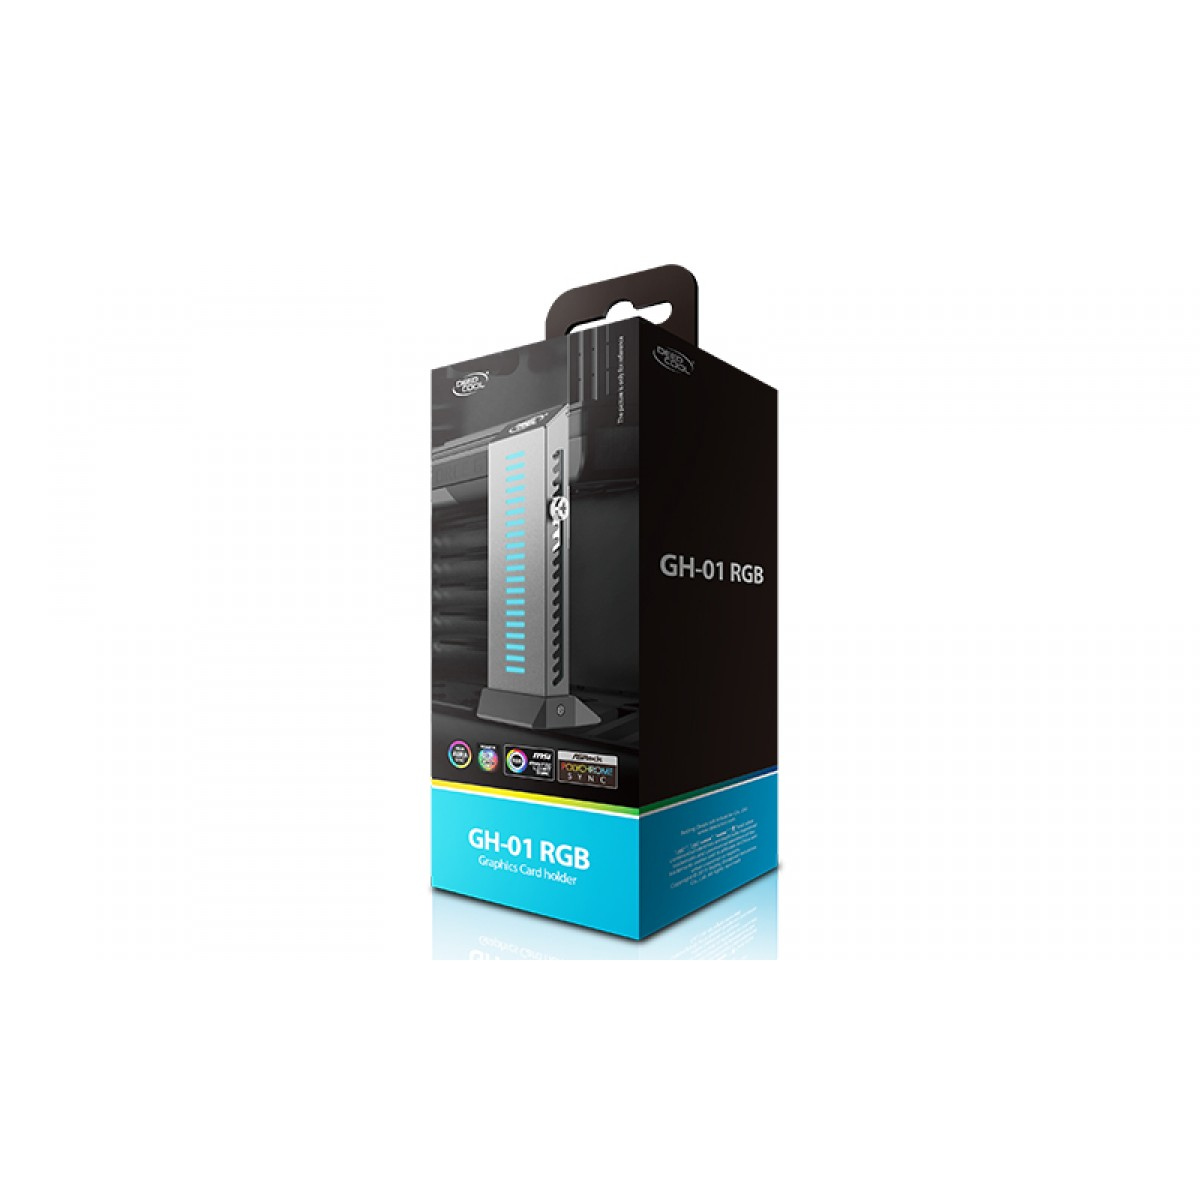 Suporte de Placa de Vídeo Deepcool GH-01 RGB, Black, GH-01 RGB